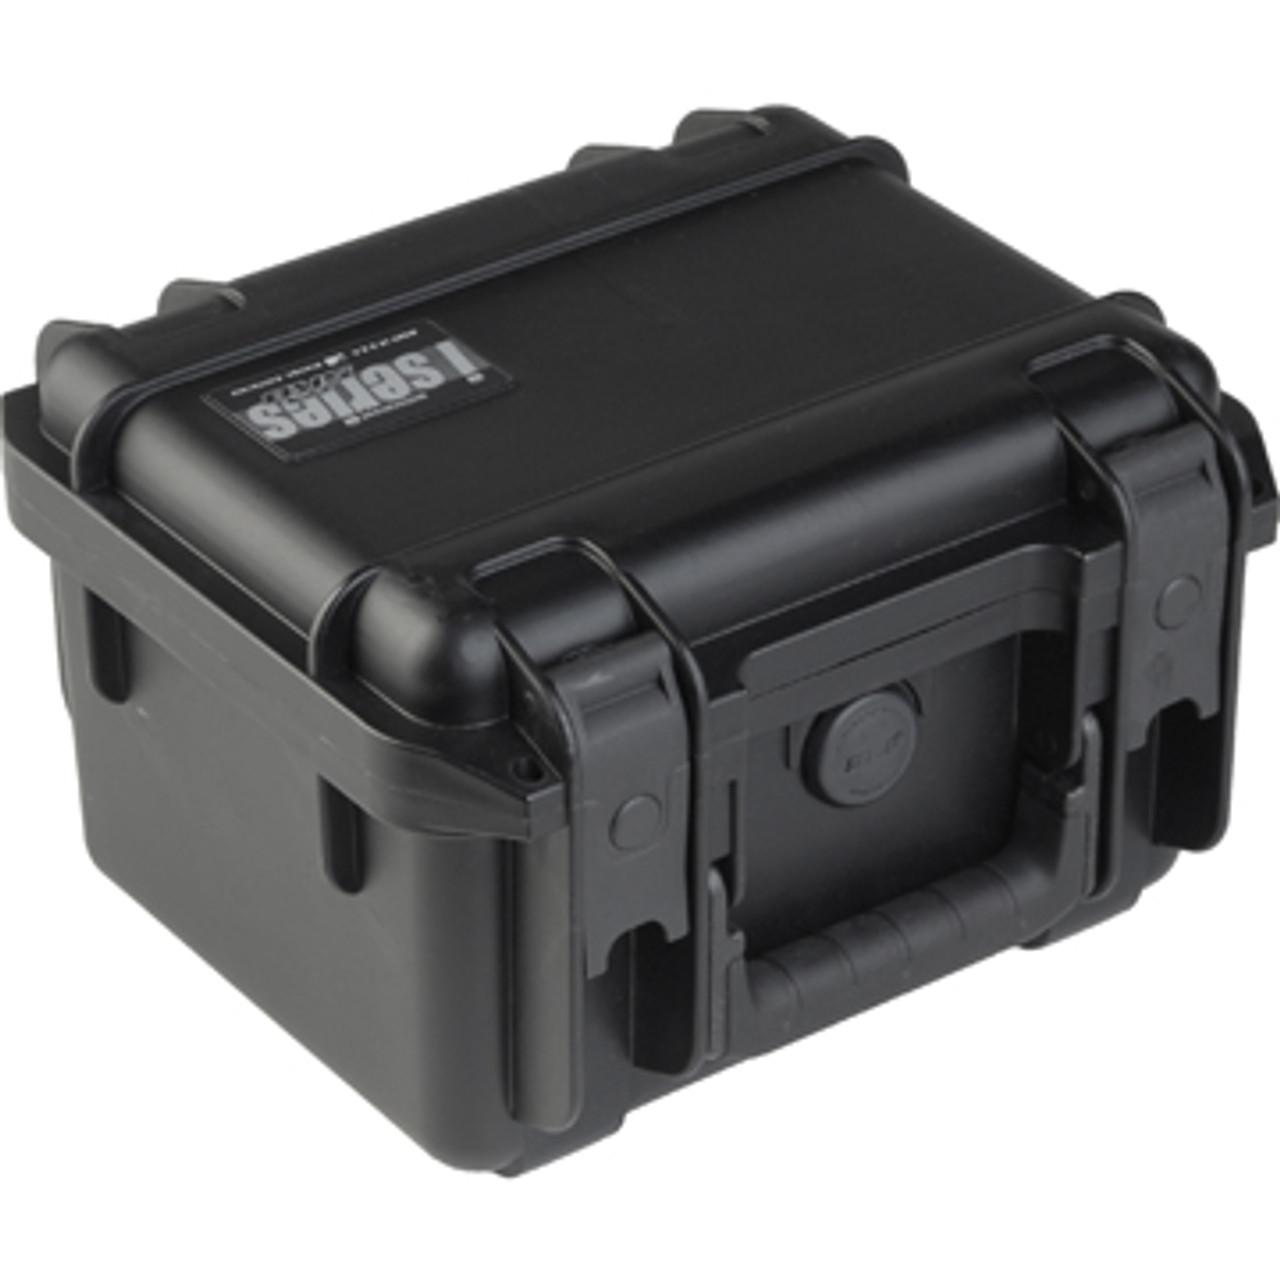 "SKB Mil-Standard Waterproof Case 6"" Deep with Cubed Foam - Black #3i-1309-6B-C"